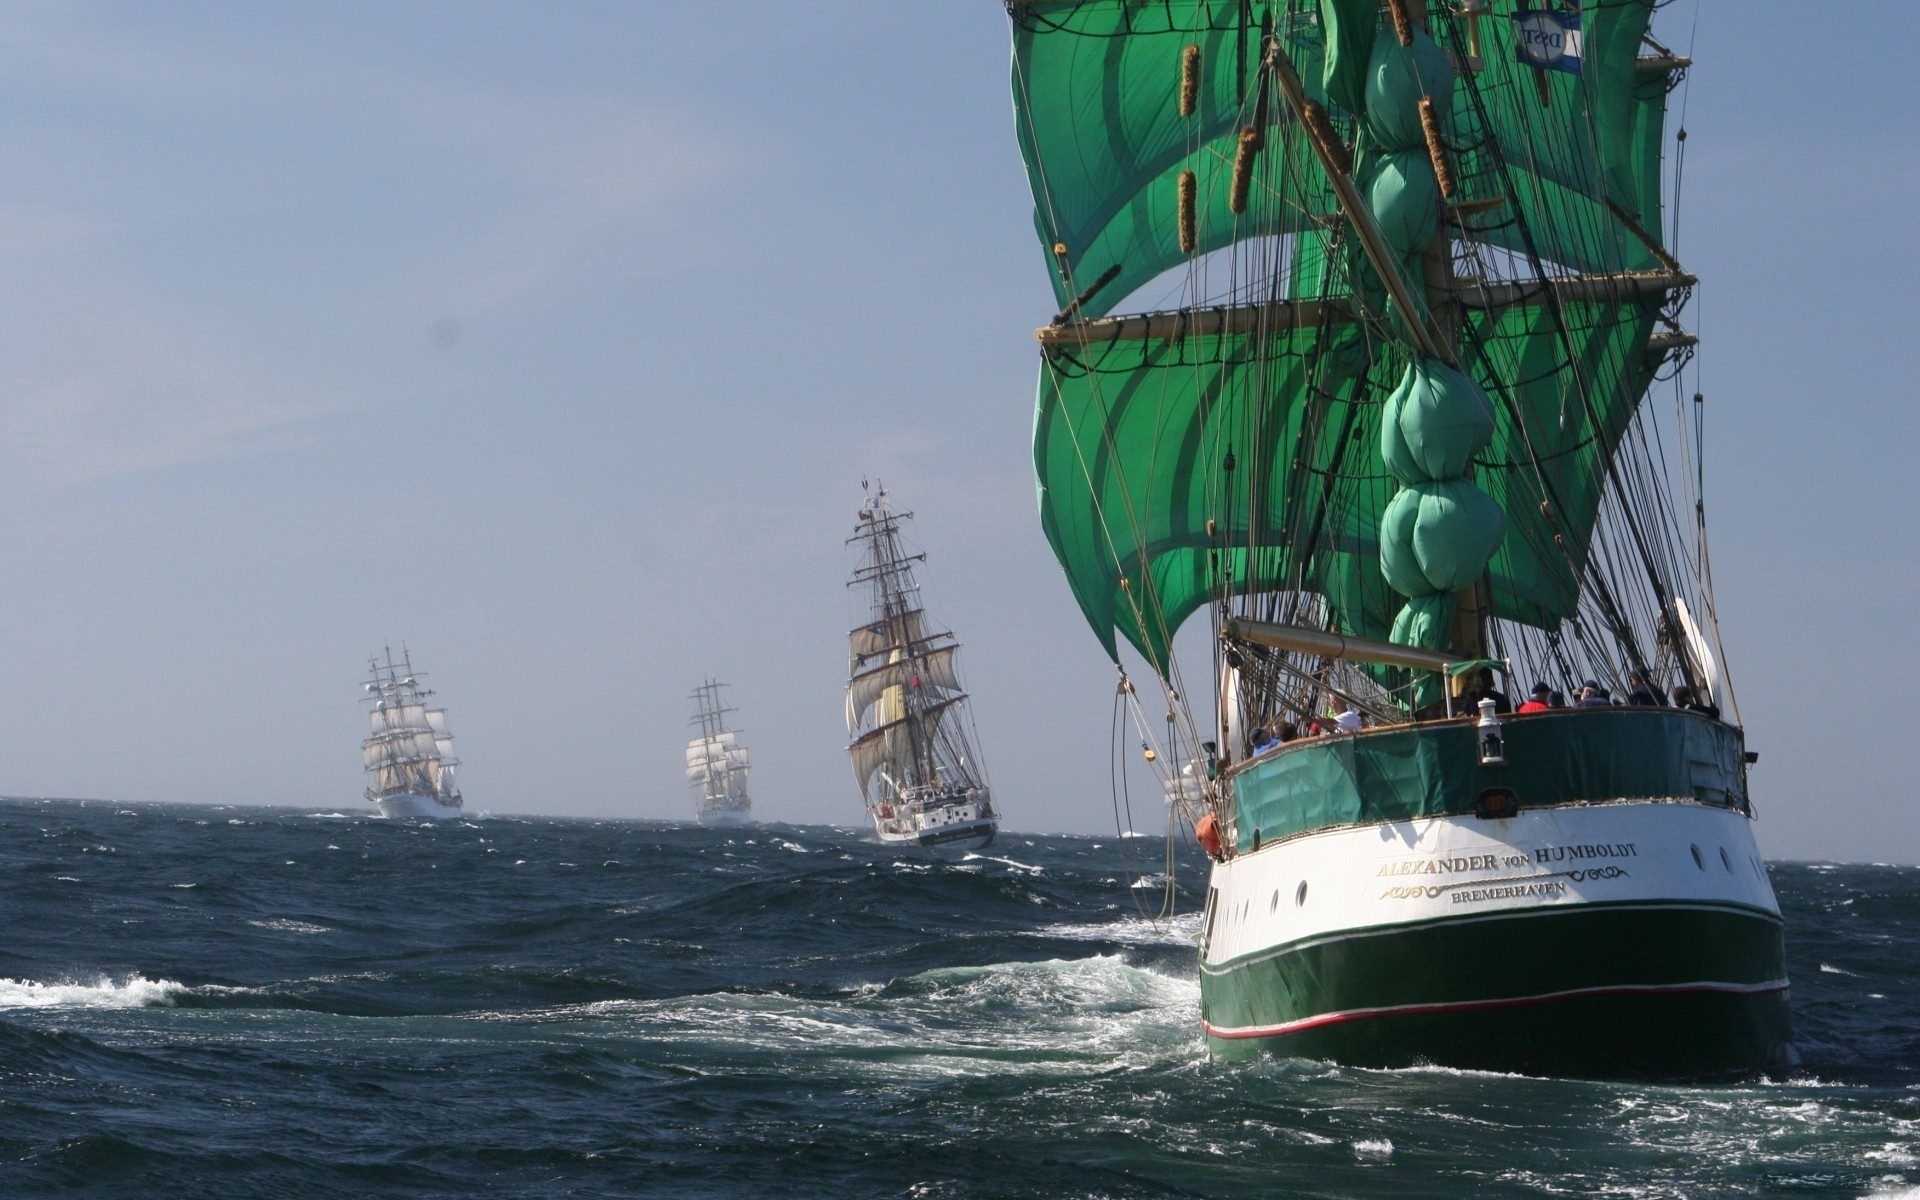 Res: 1920x1200, Tall Ships Races gray ocean races sea ship water